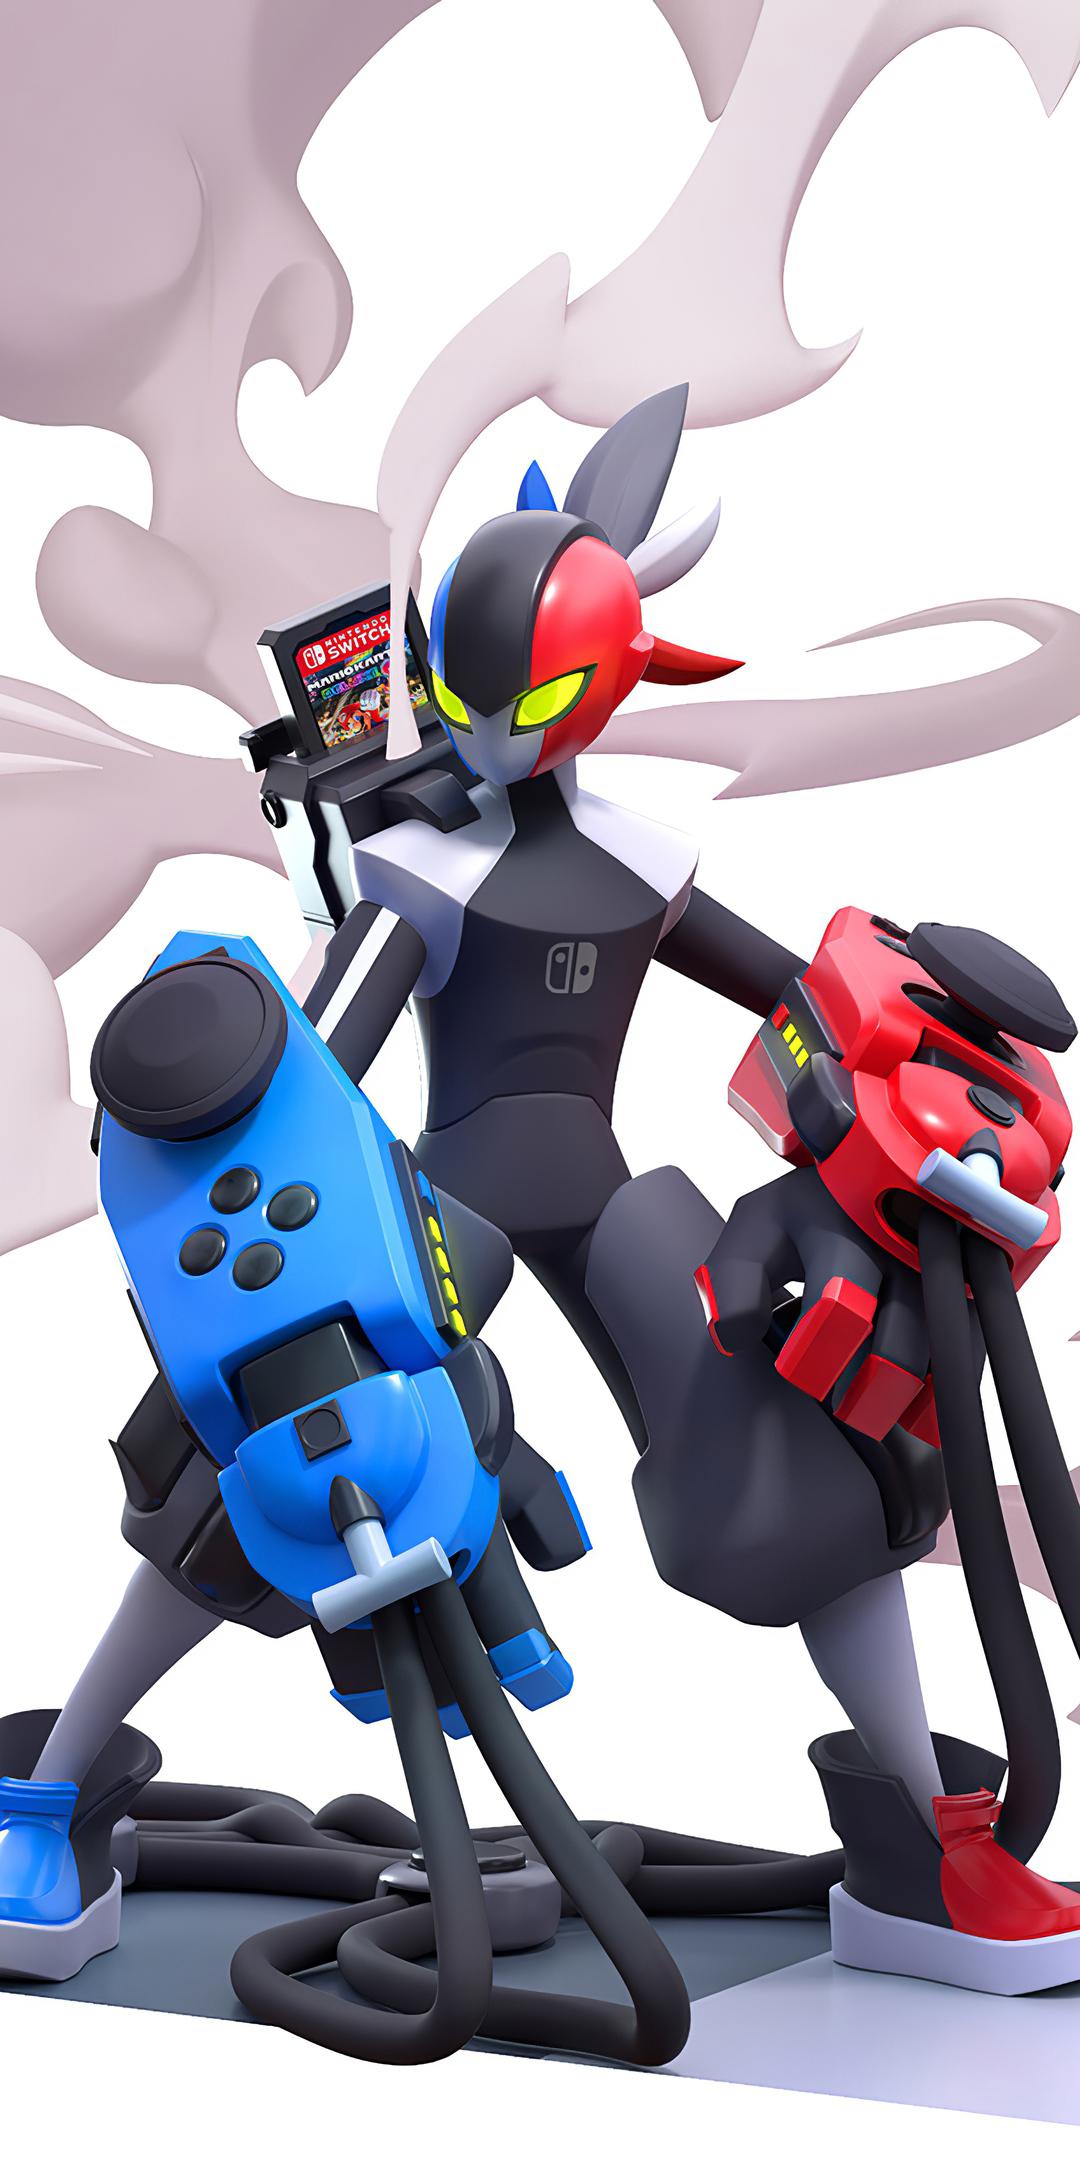 1080x2160 Nintendo Switch Hero 4k One Plus 5T,Honor 7x ...